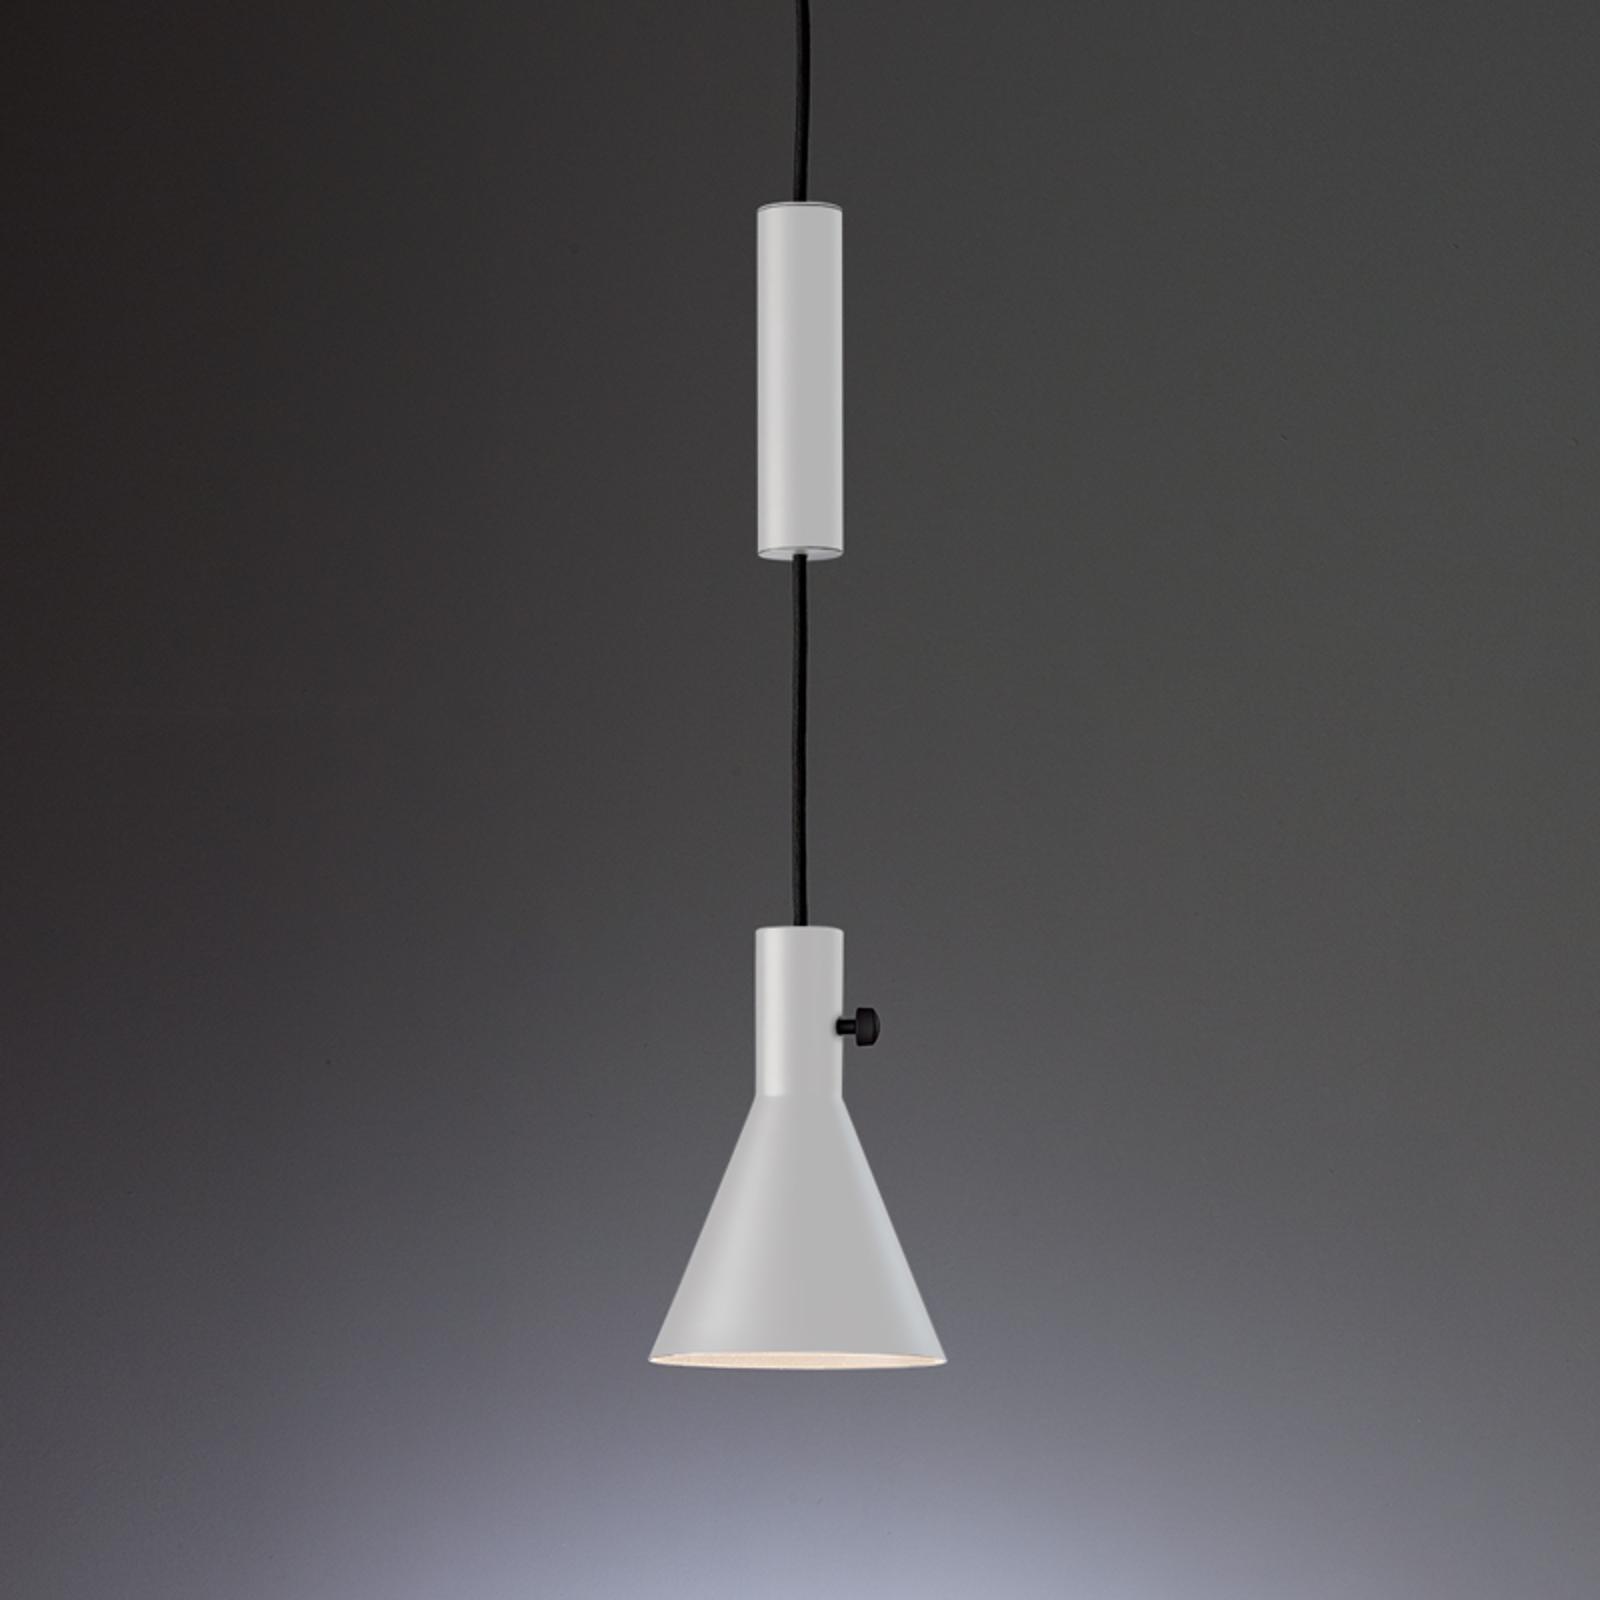 TECNOLUMEN Eleu - LED-Pendelleuchte, weiß